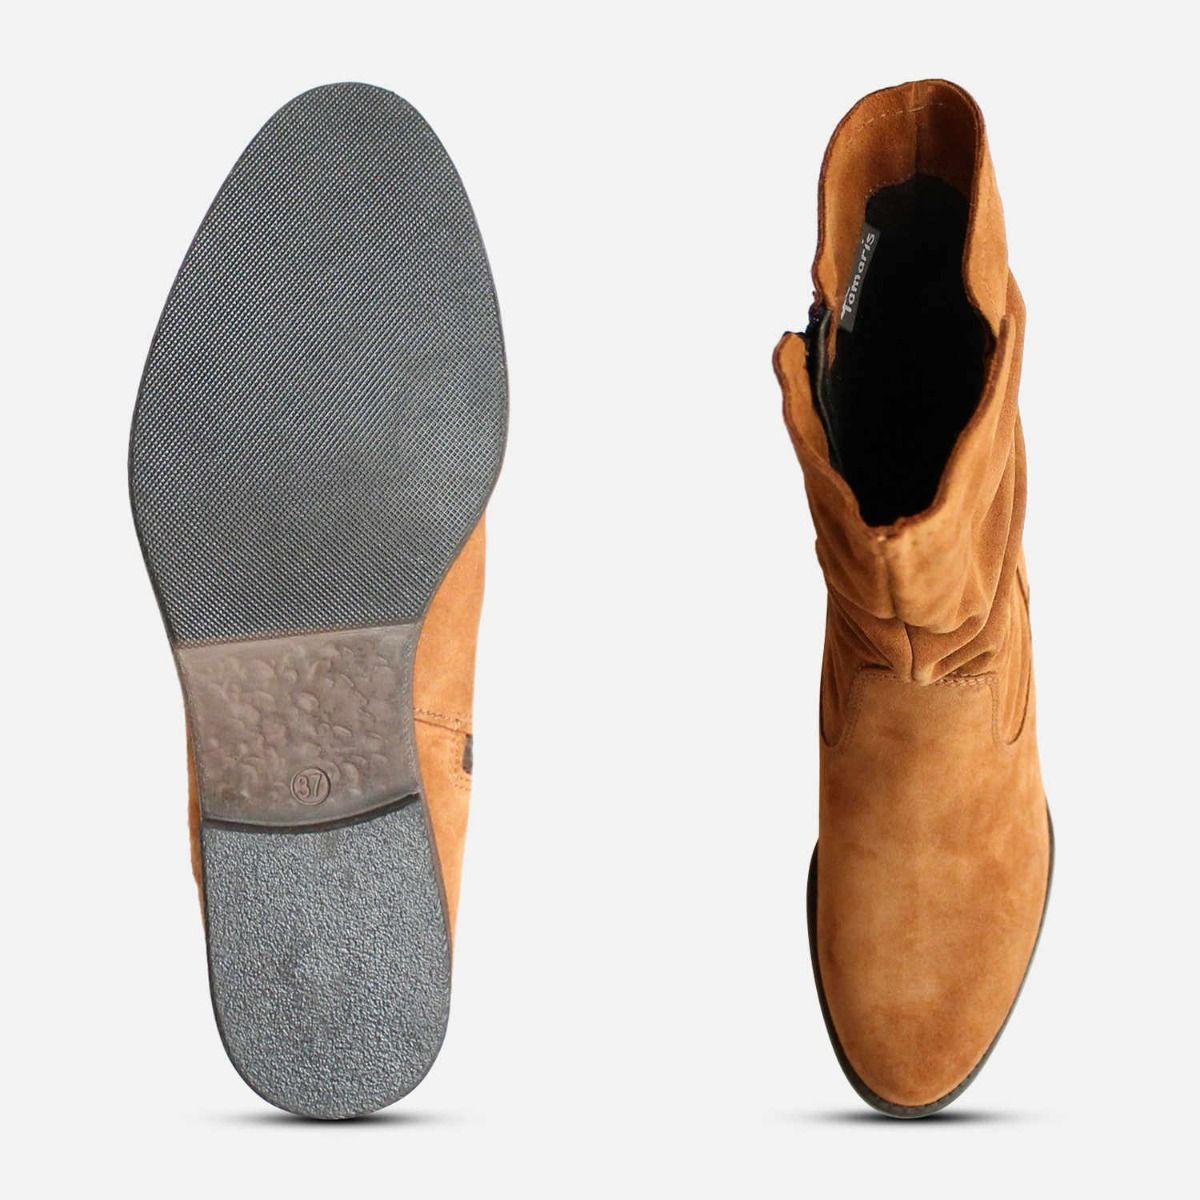 Tamaris Ruched Boots in Cognac Suede